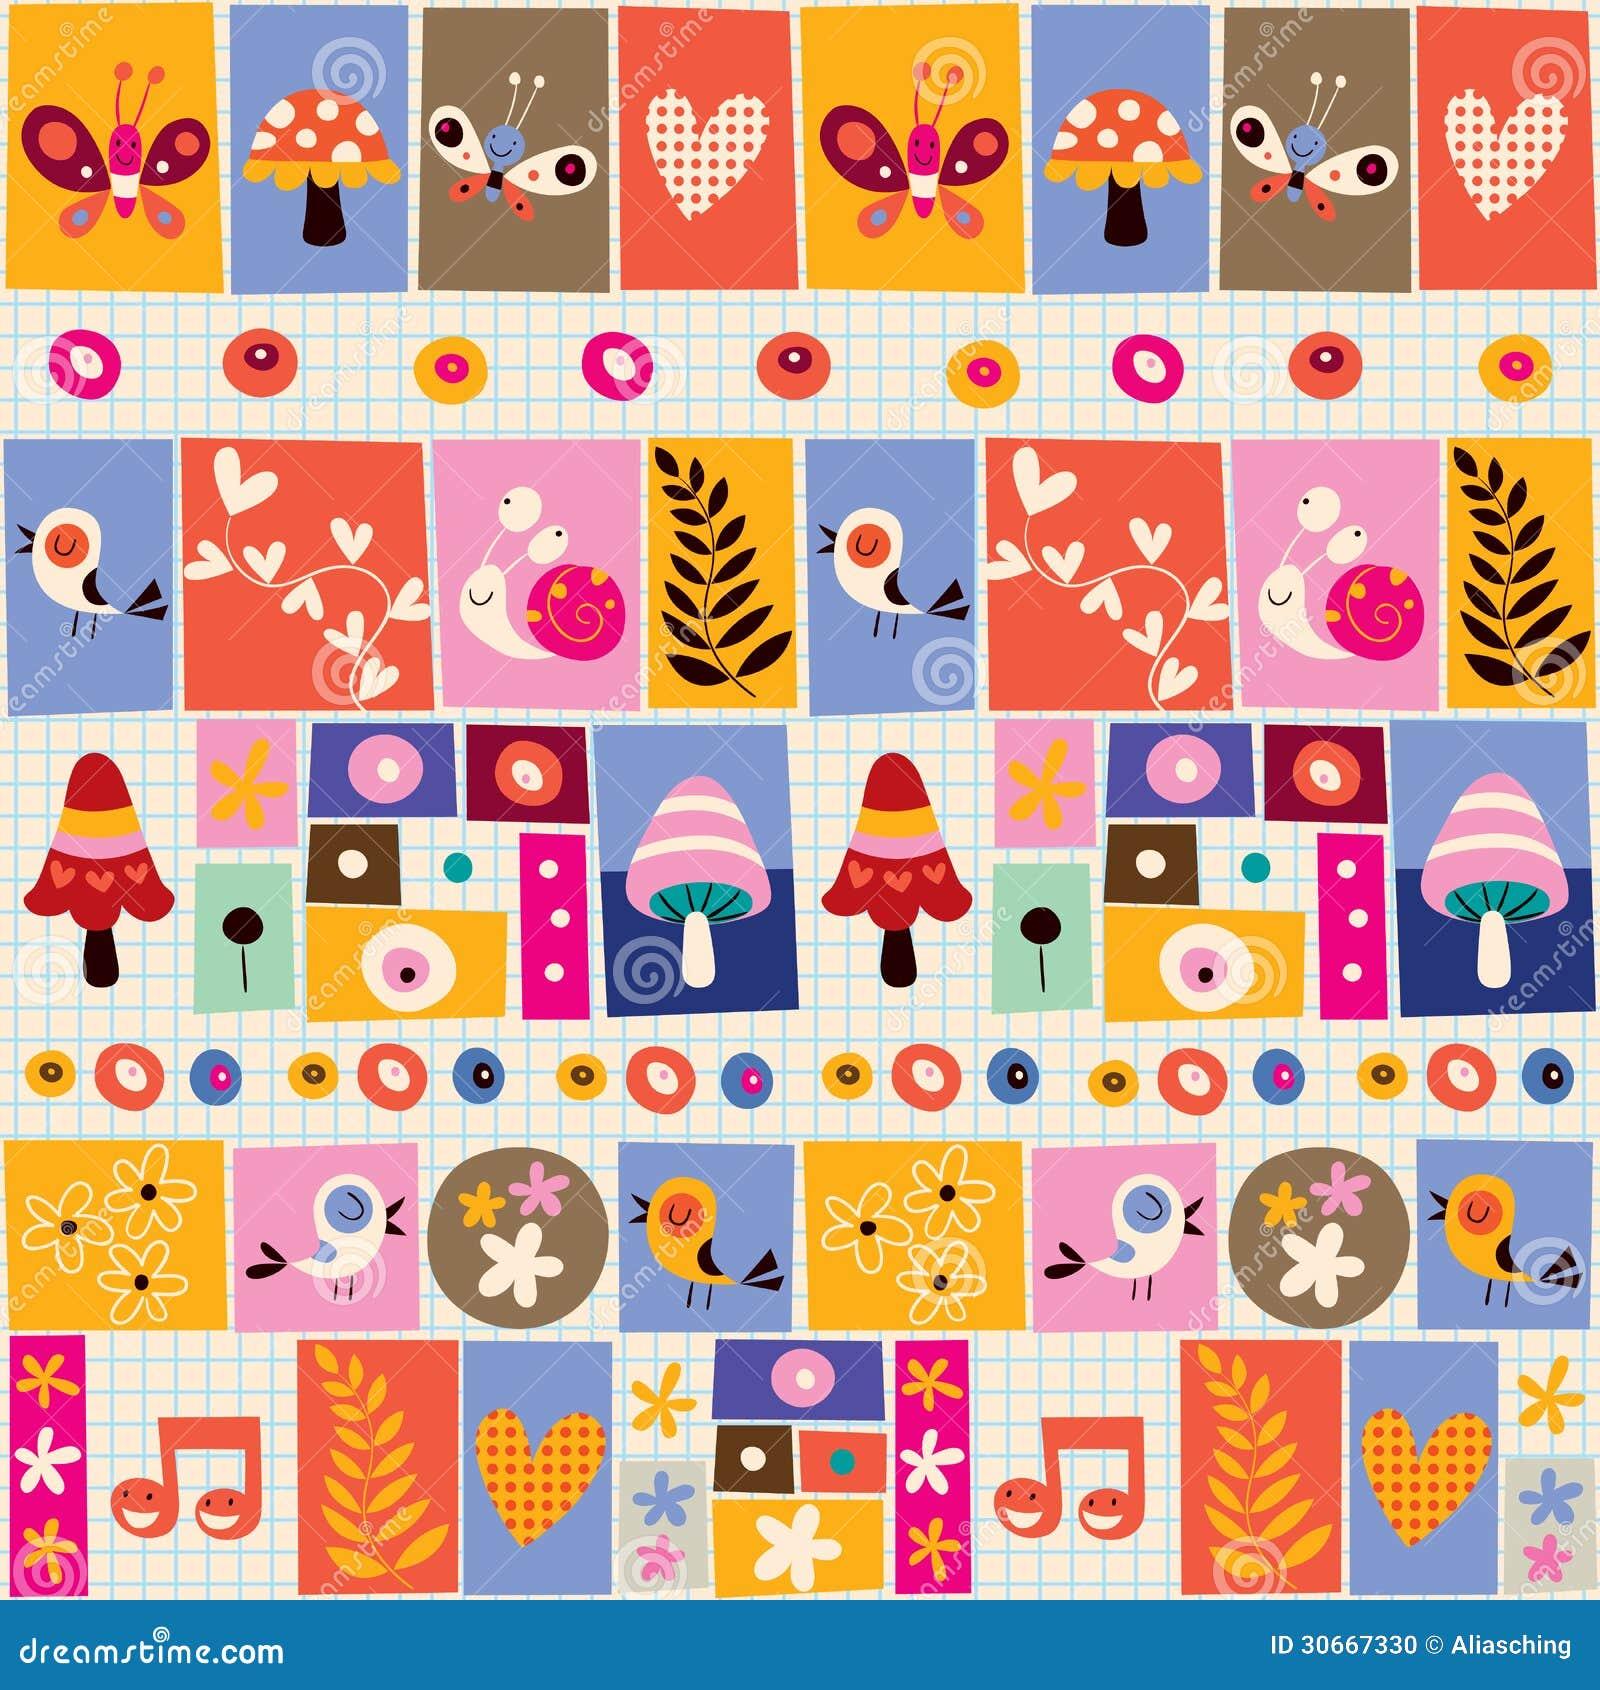 Cute Flowers, Birds, Mushrooms & Snails Collage Pattern ...